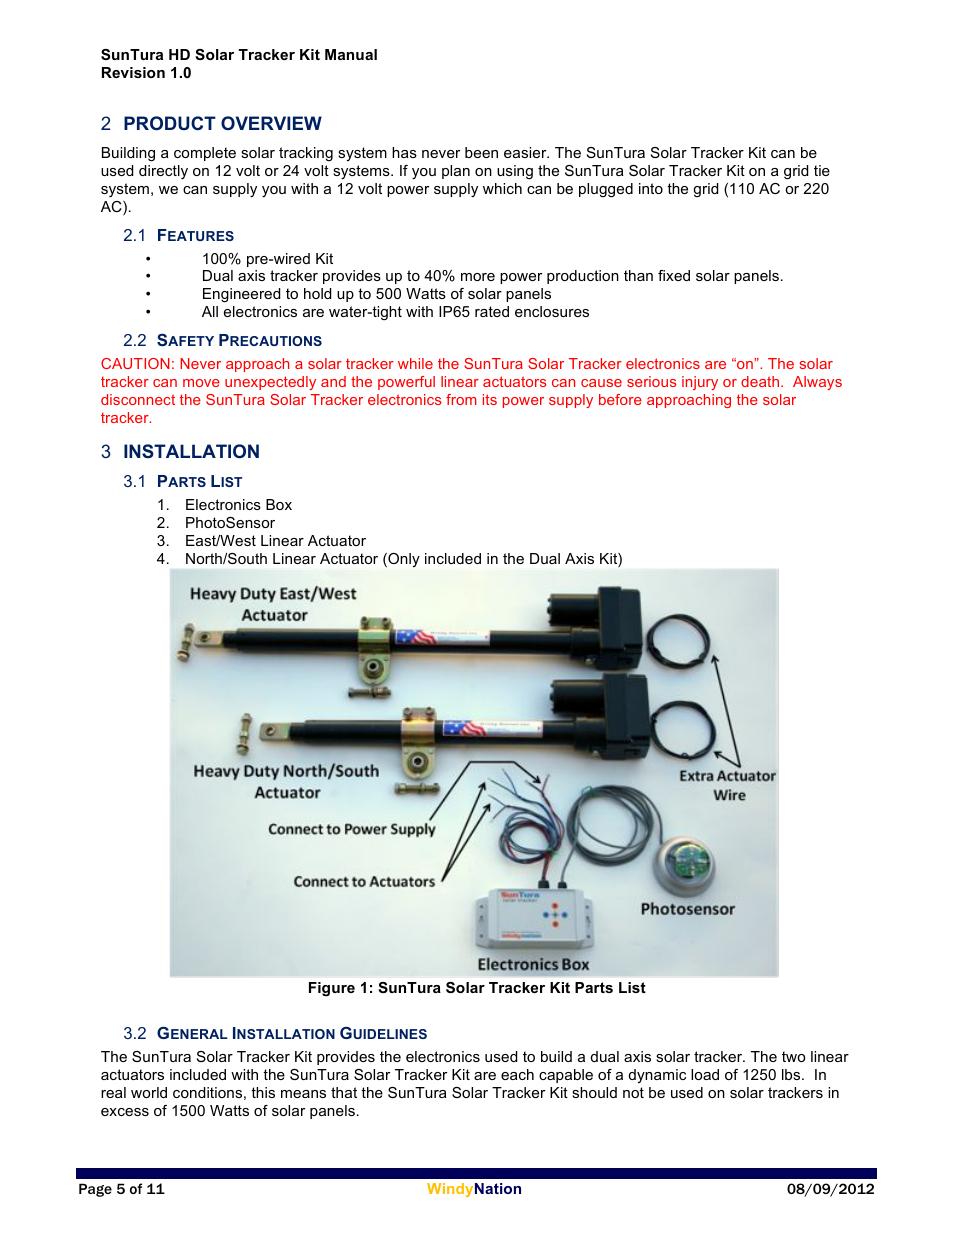 Windy Nation Suntura Series Solar Tracker HD User Manual